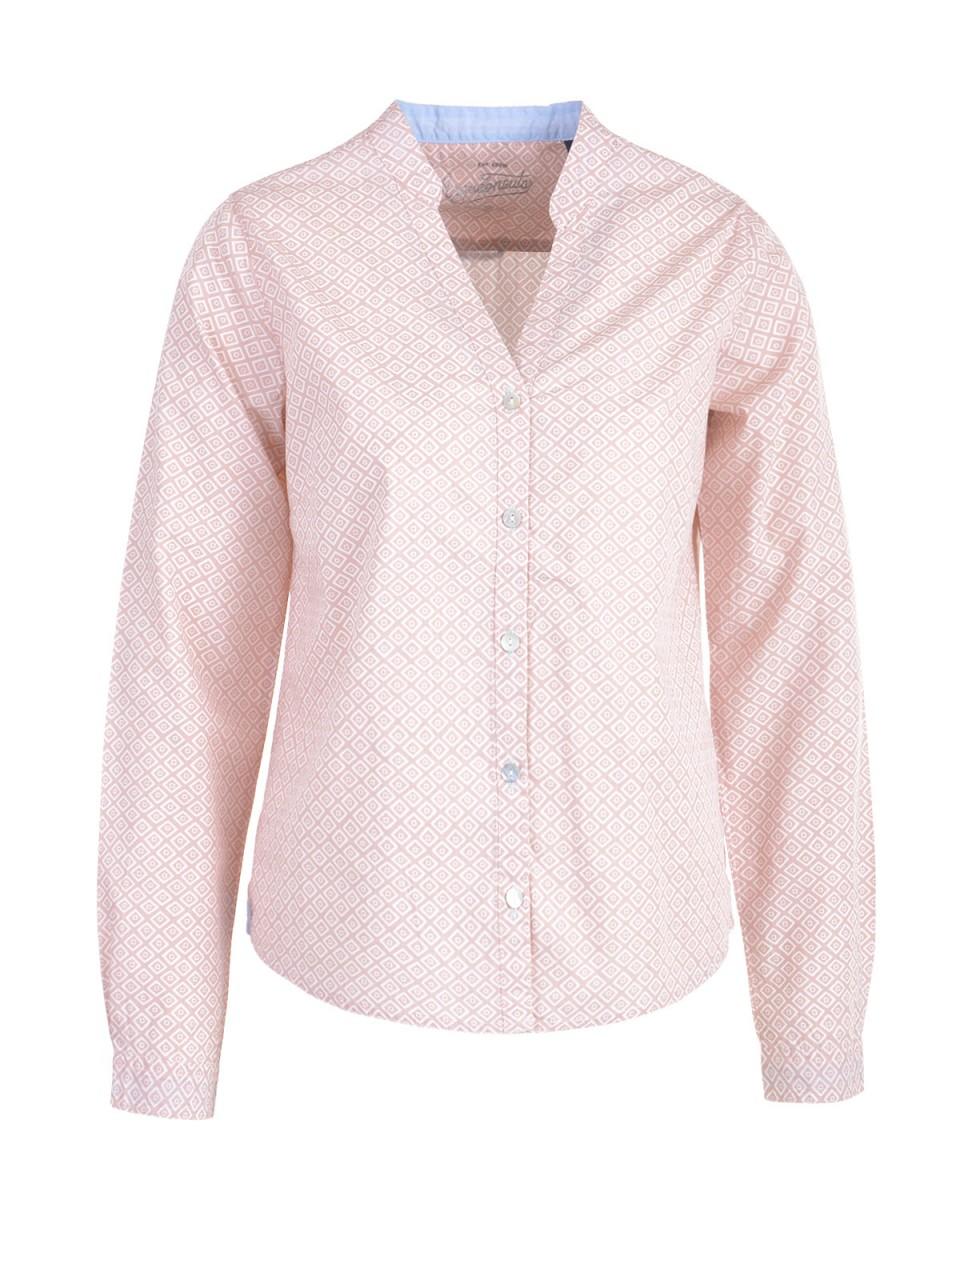 arqueonautas-damen-bluse-rosa-wei-szlig-